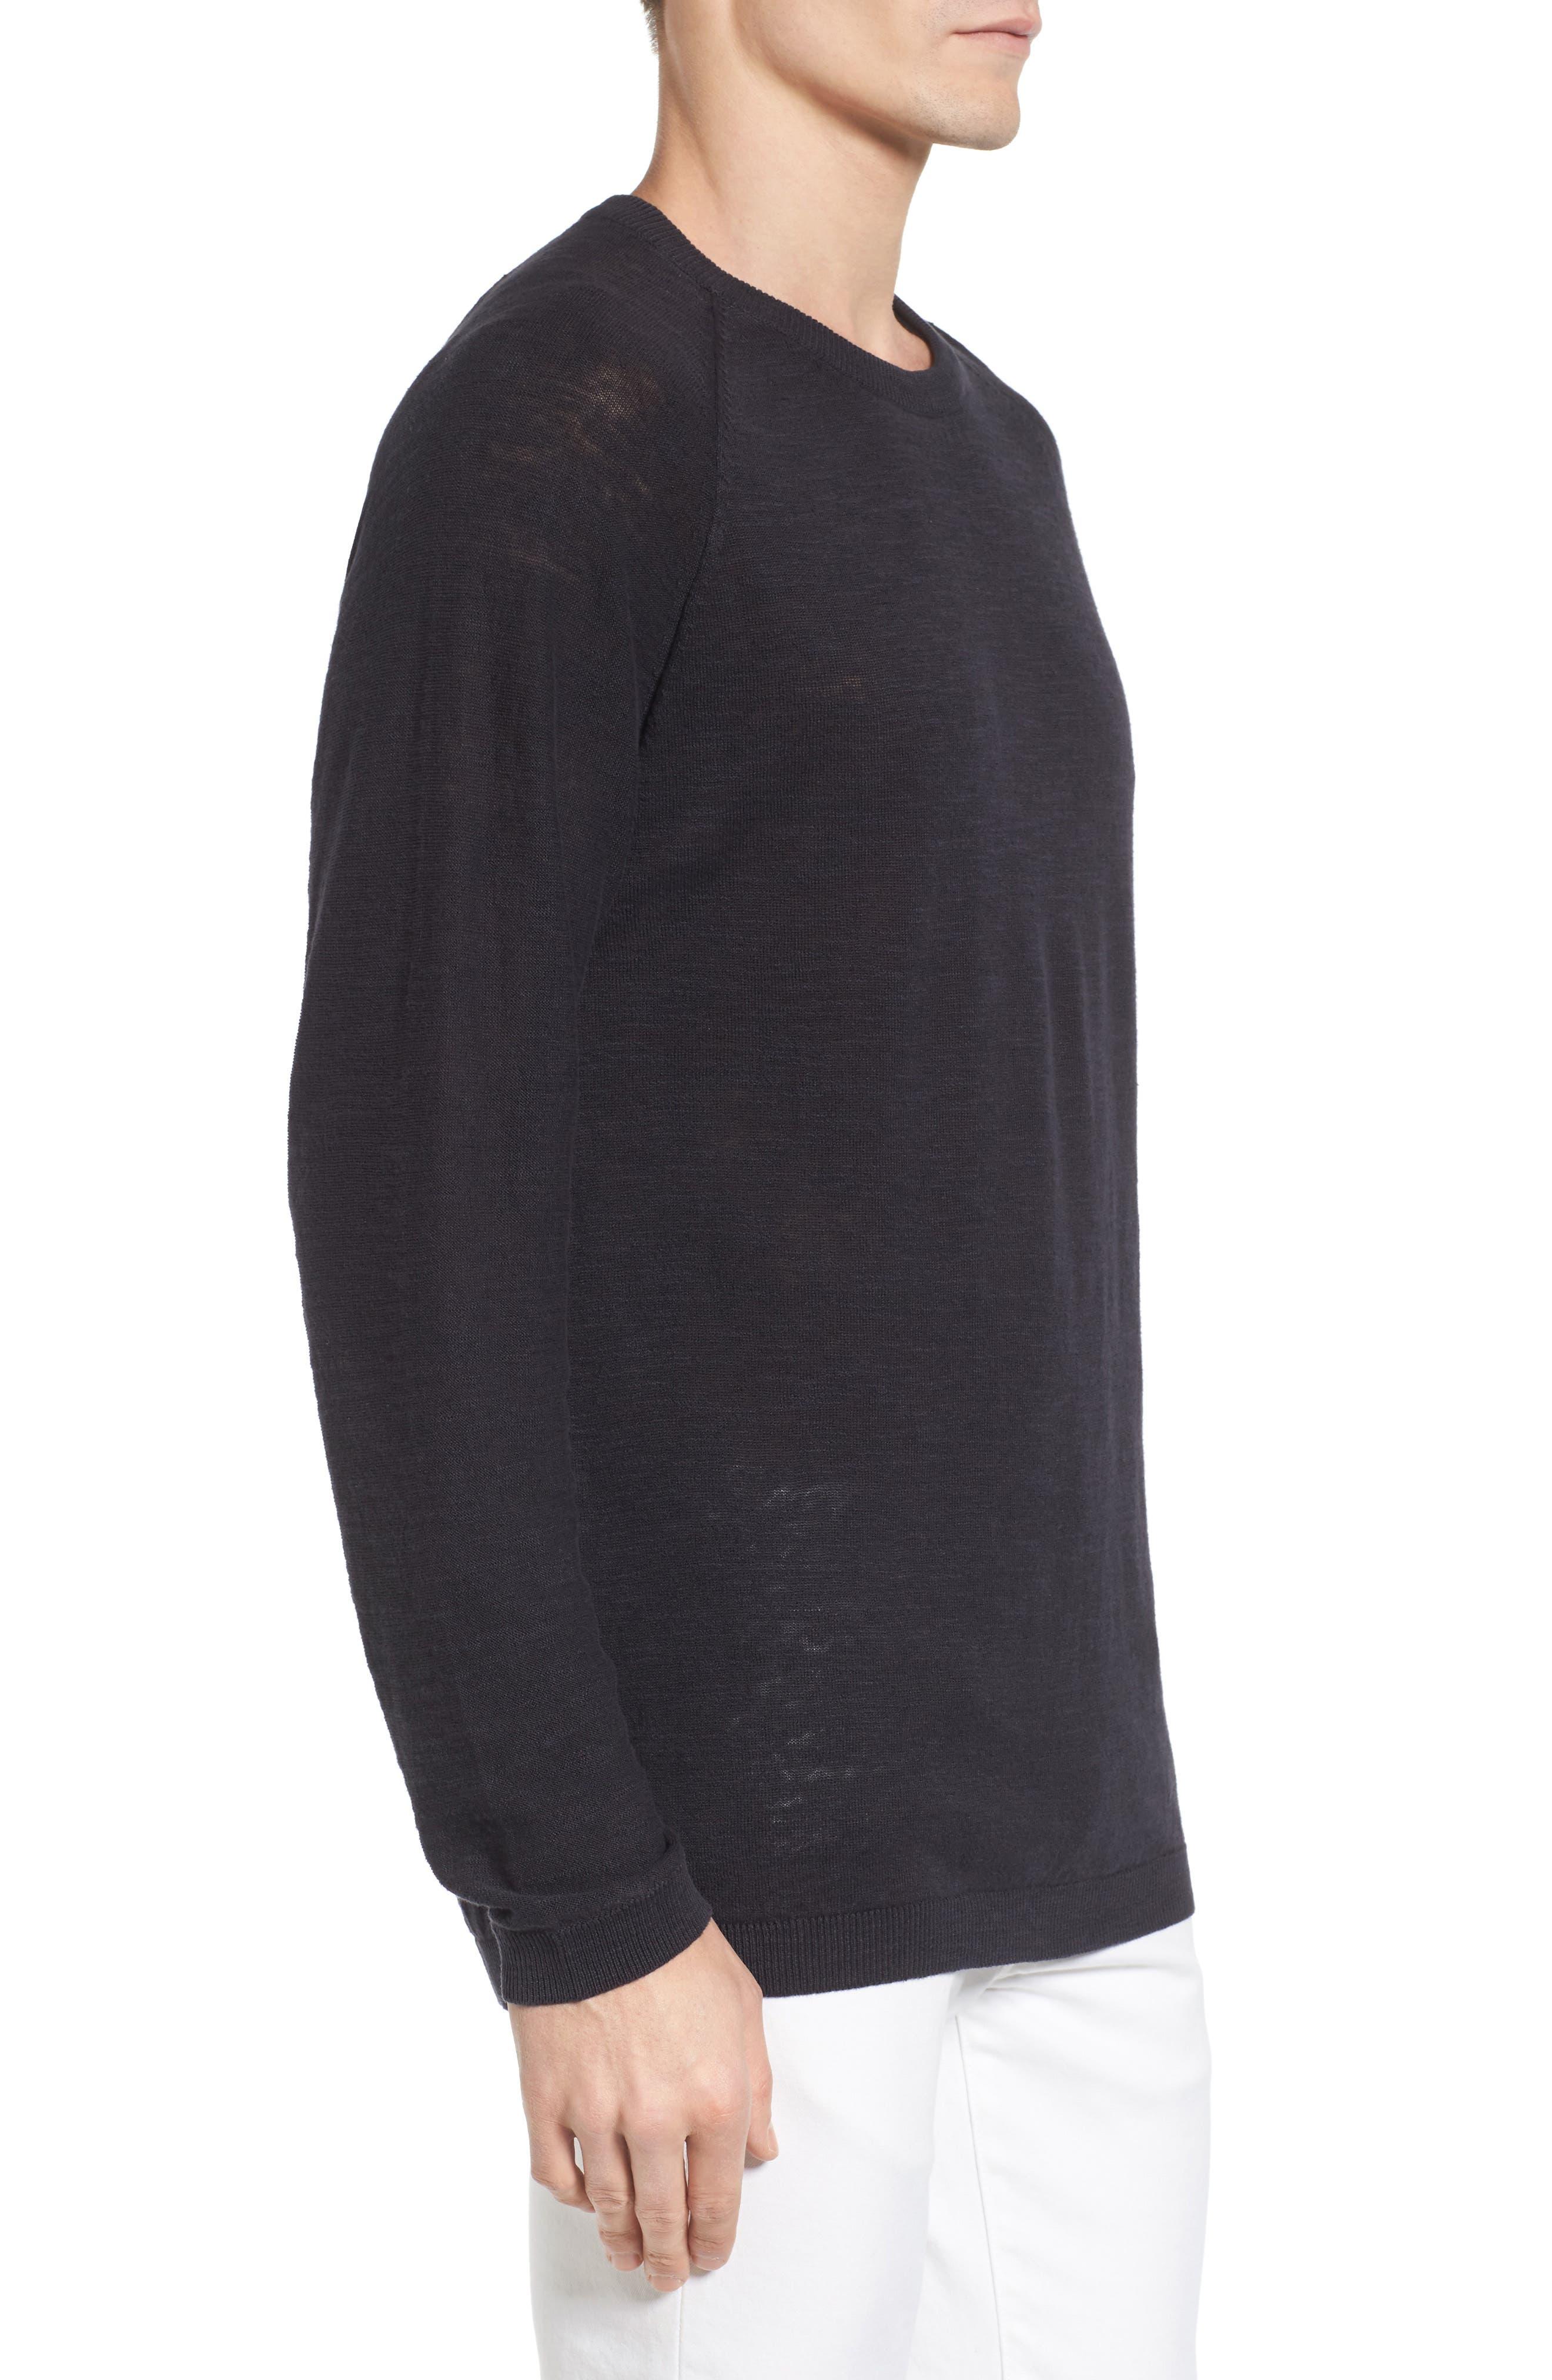 Arambol Cotton & Linen Sweater,                             Alternate thumbnail 3, color,                             409